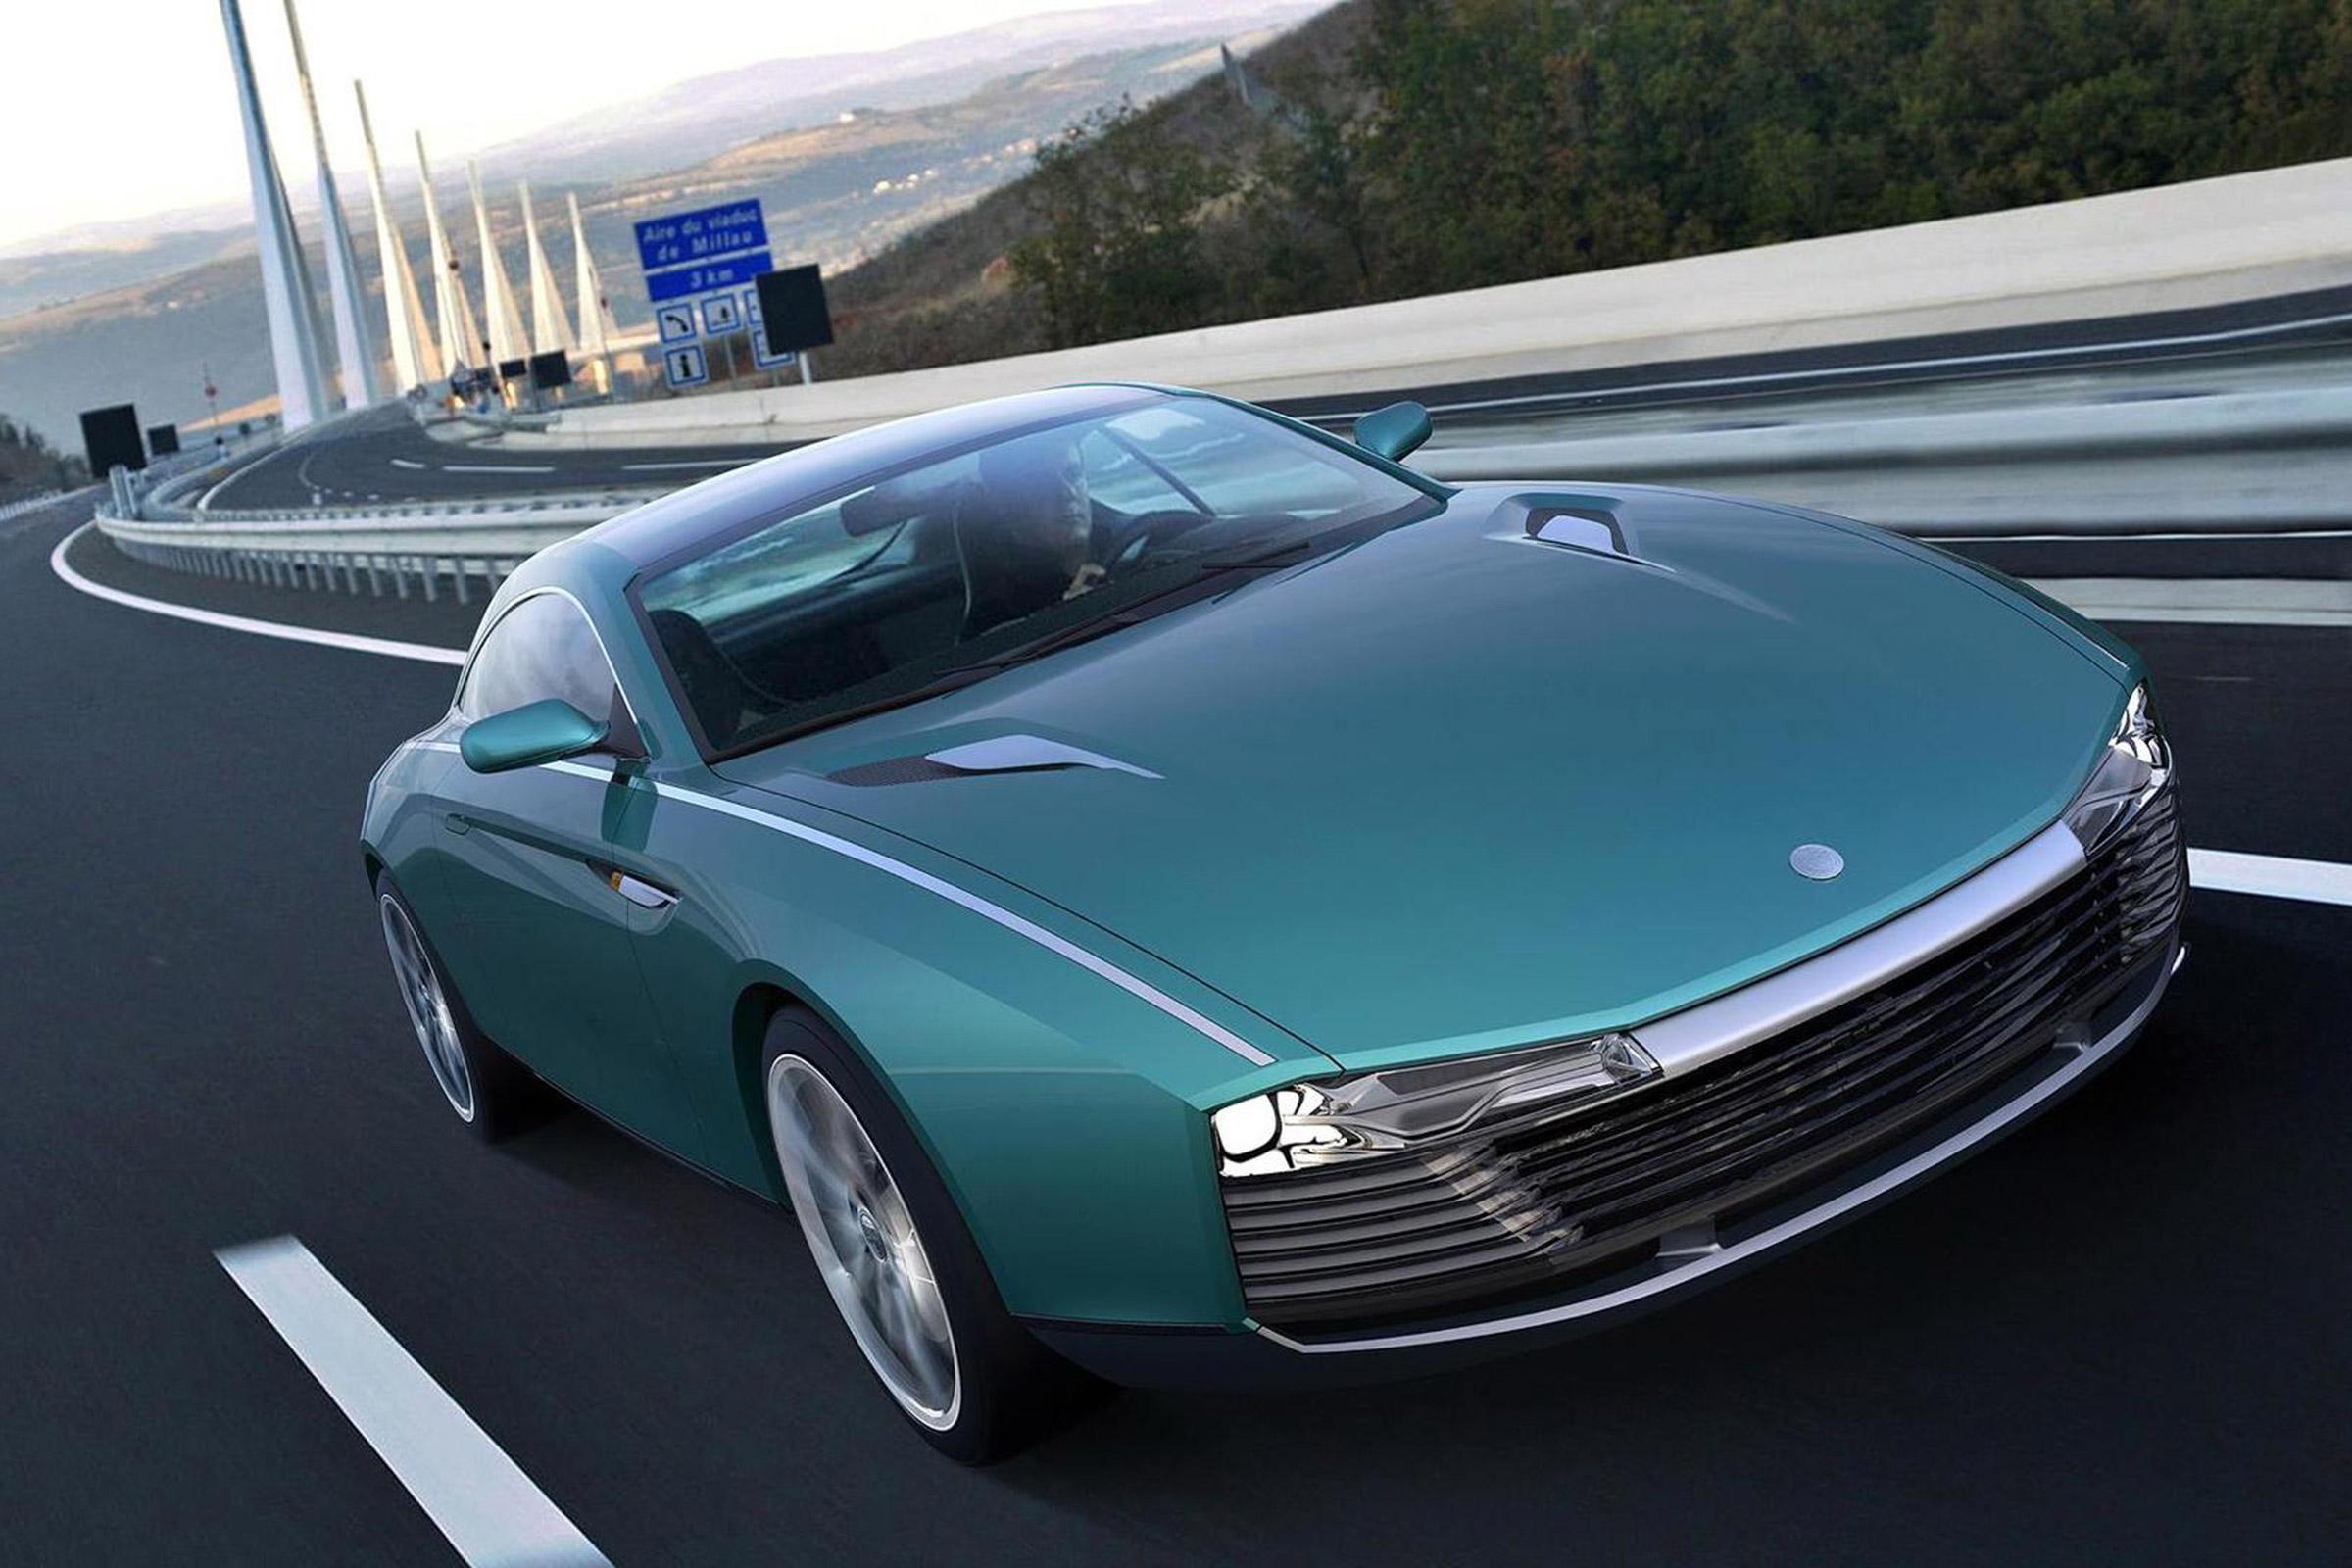 Cardi 442 Concept - Autovisie.nl - Aston Martin DB9